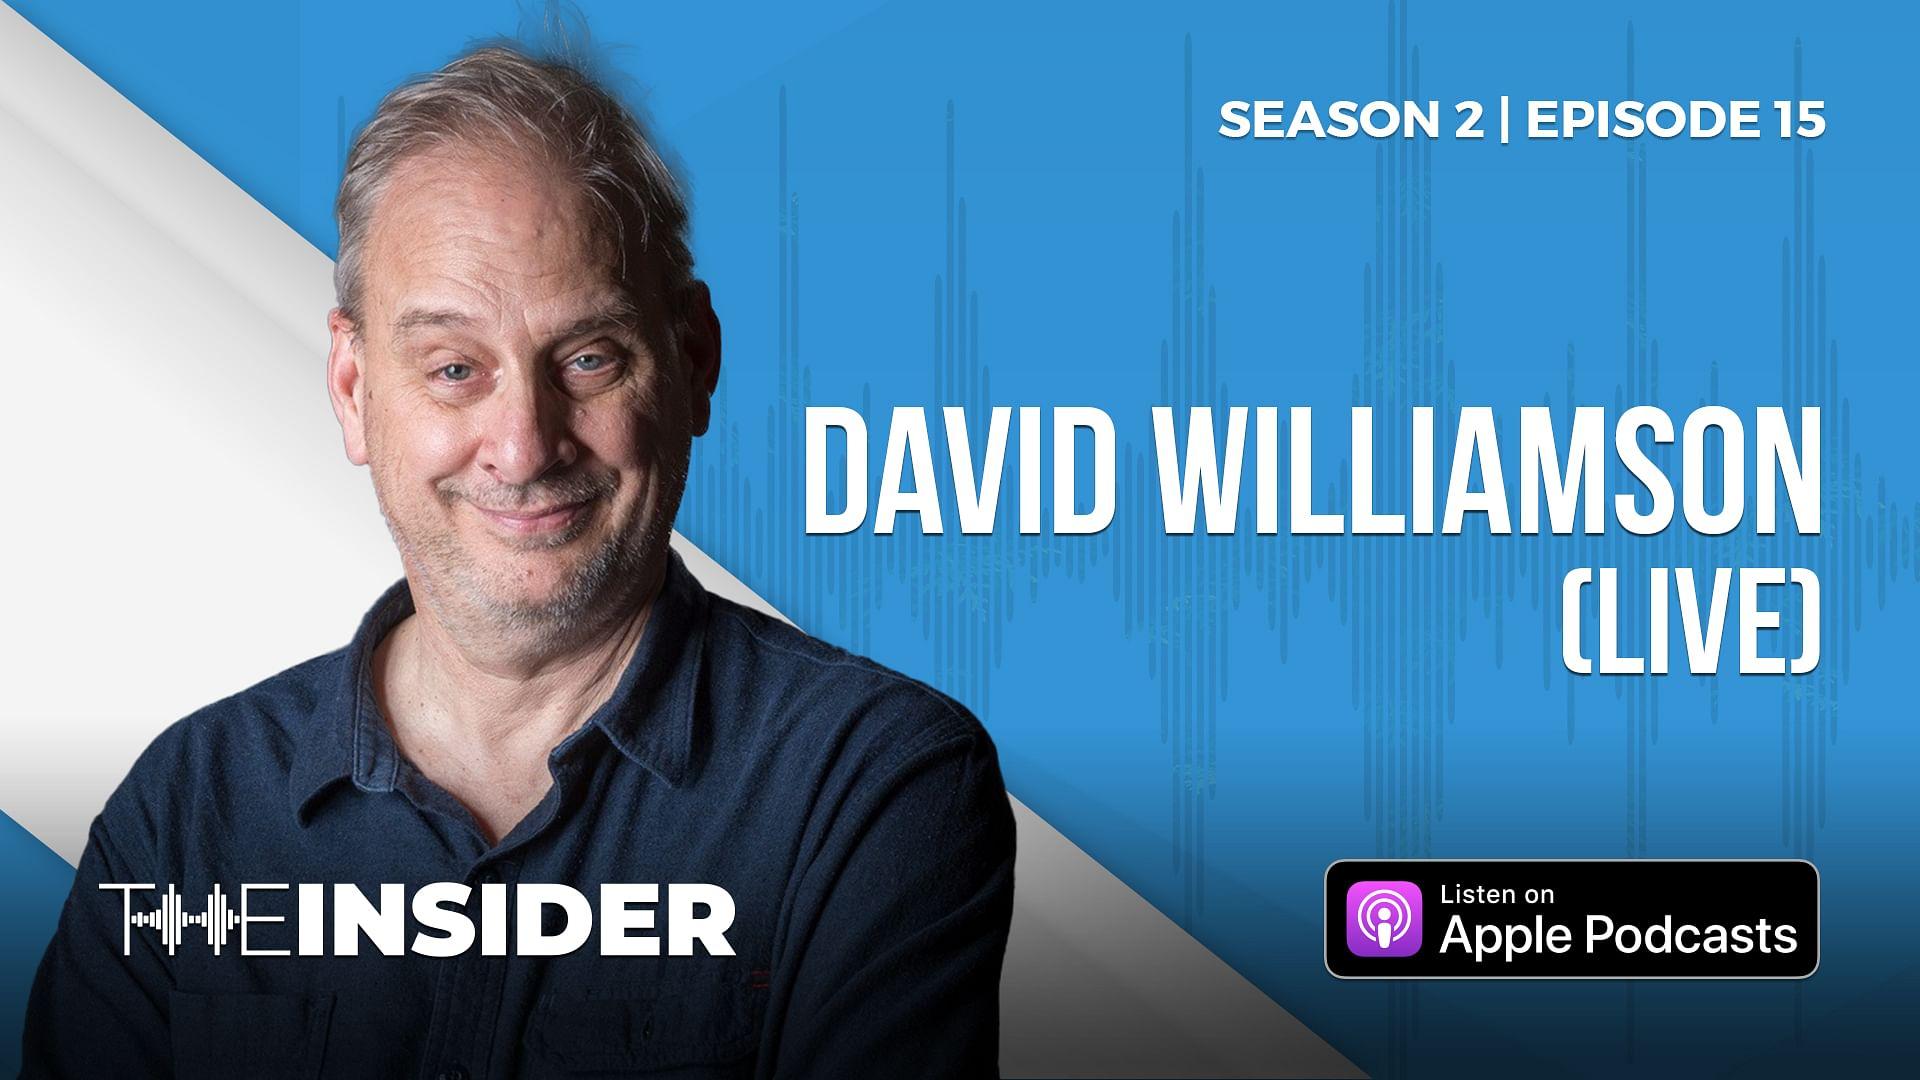 The Insider | David Williamson - Live